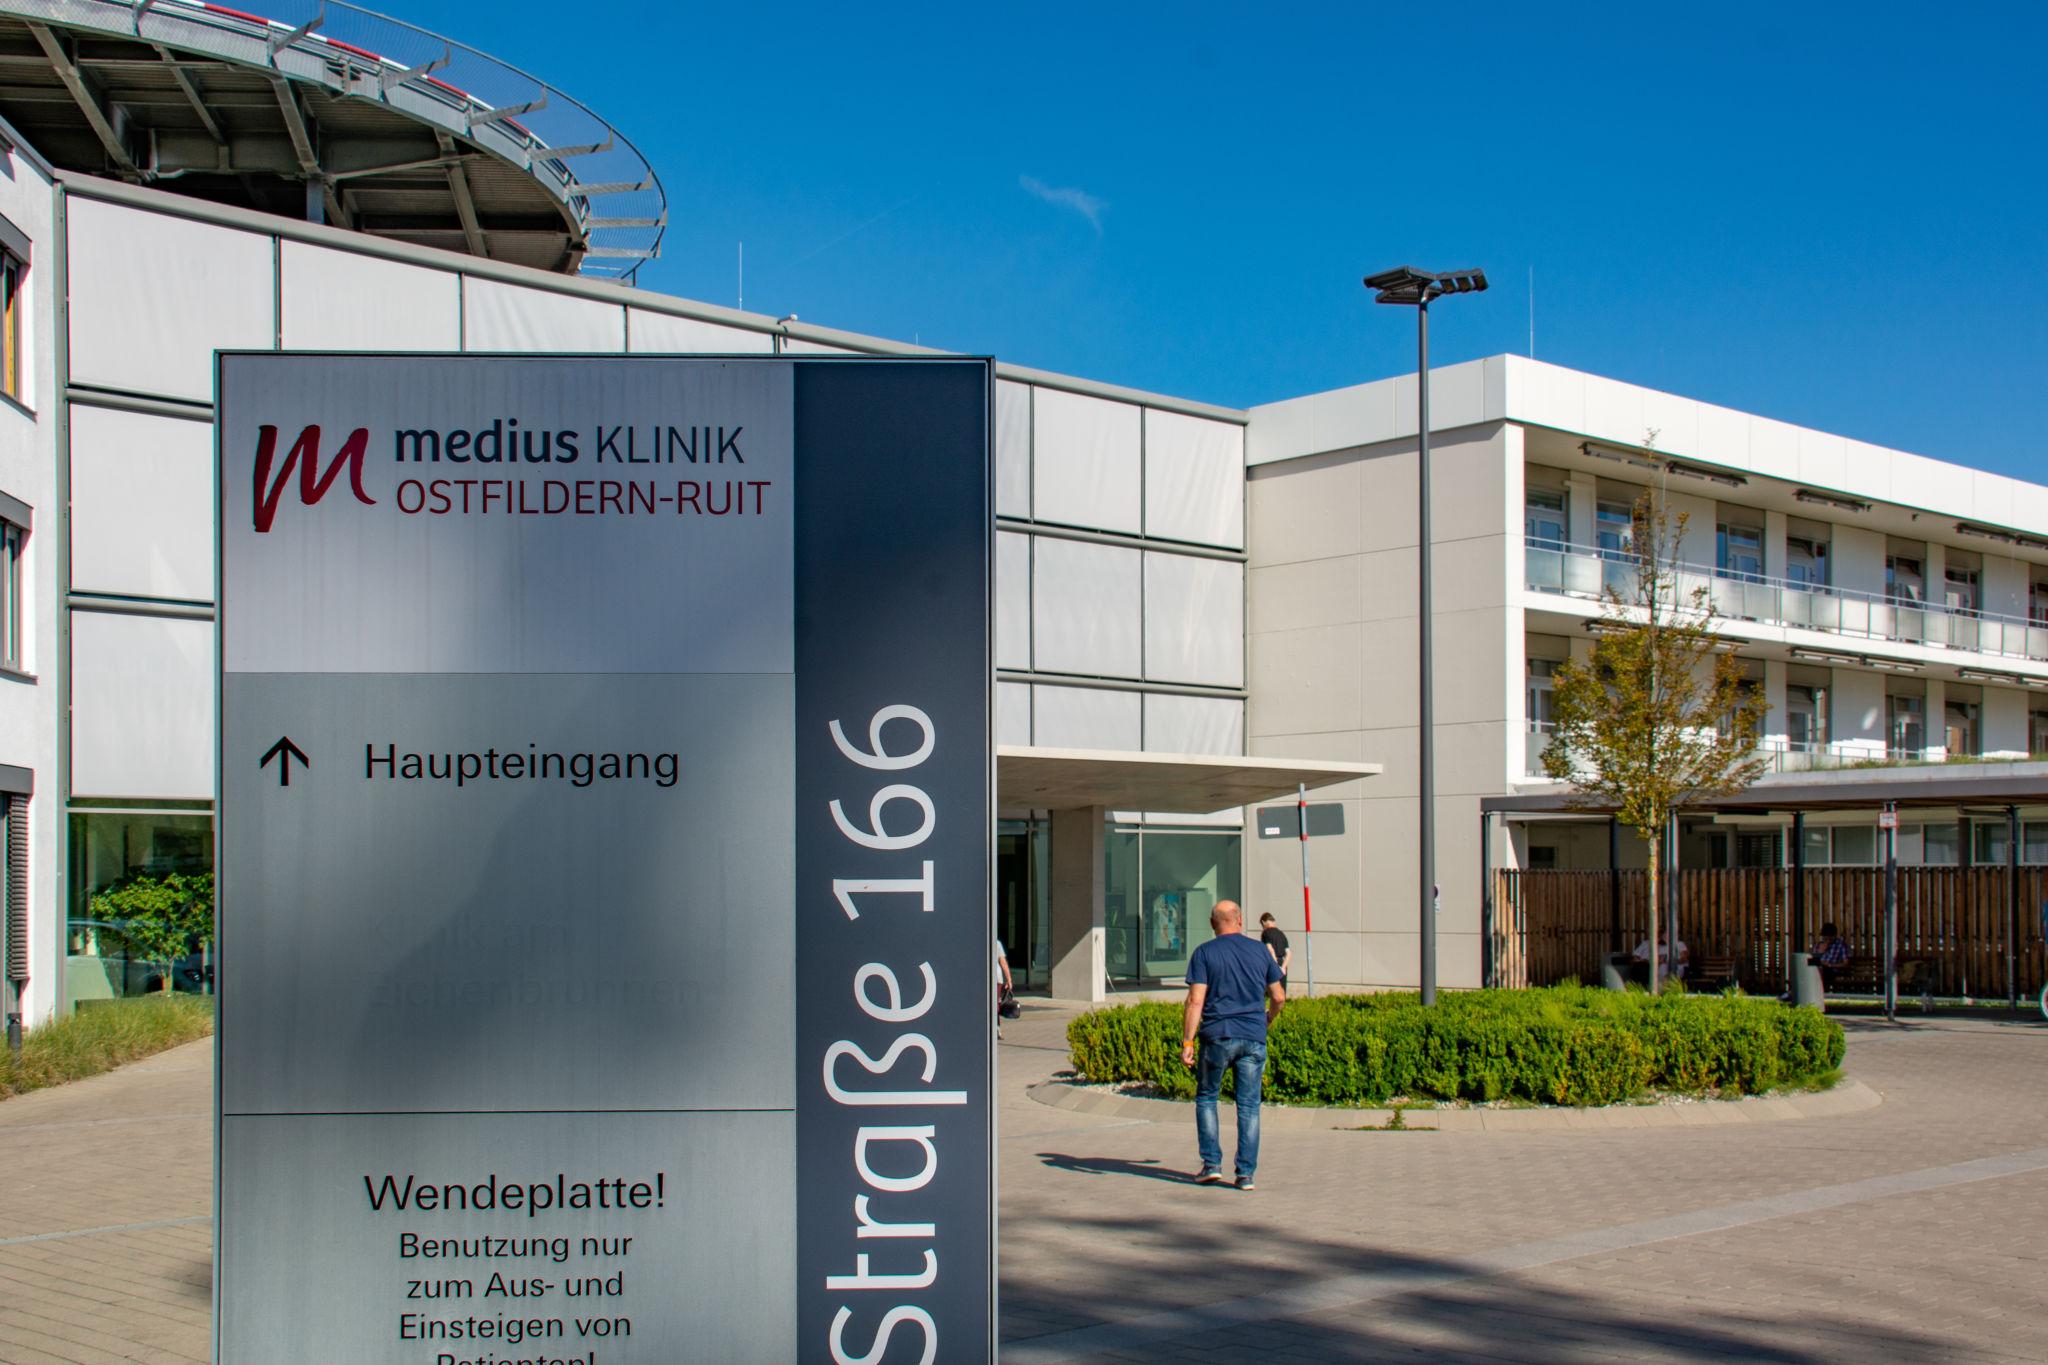 Medius Klinik Ruit | Krankenhaus in Ostfildern